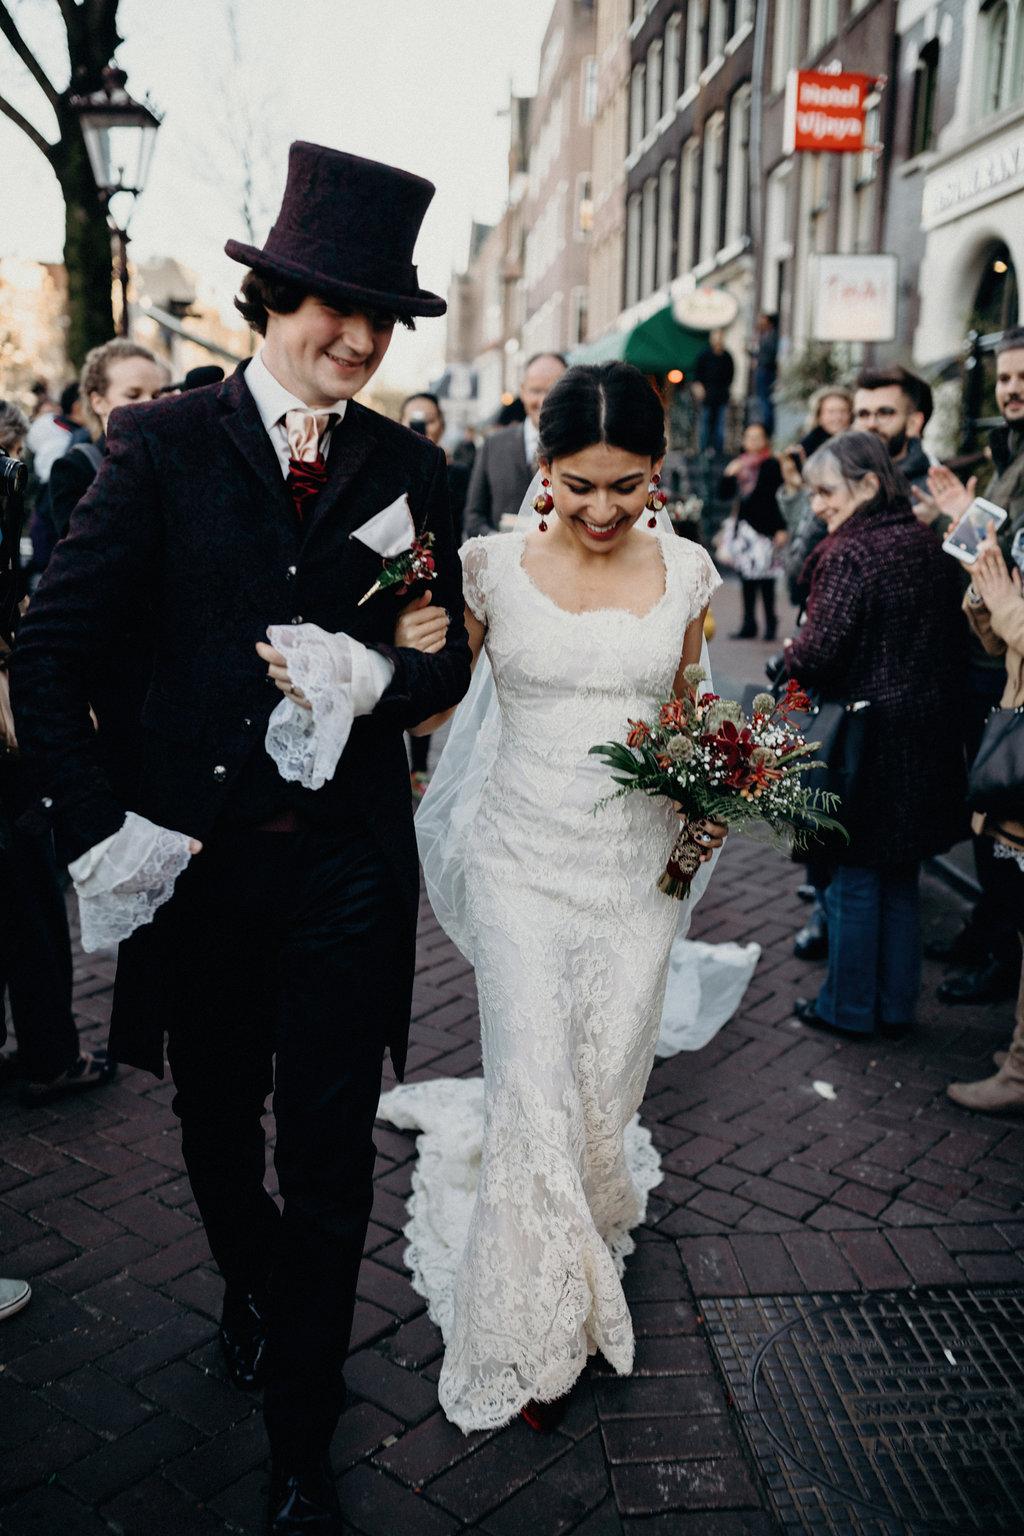 230-sjoerdbooijphotography-wedding-coen-janaina.jpg